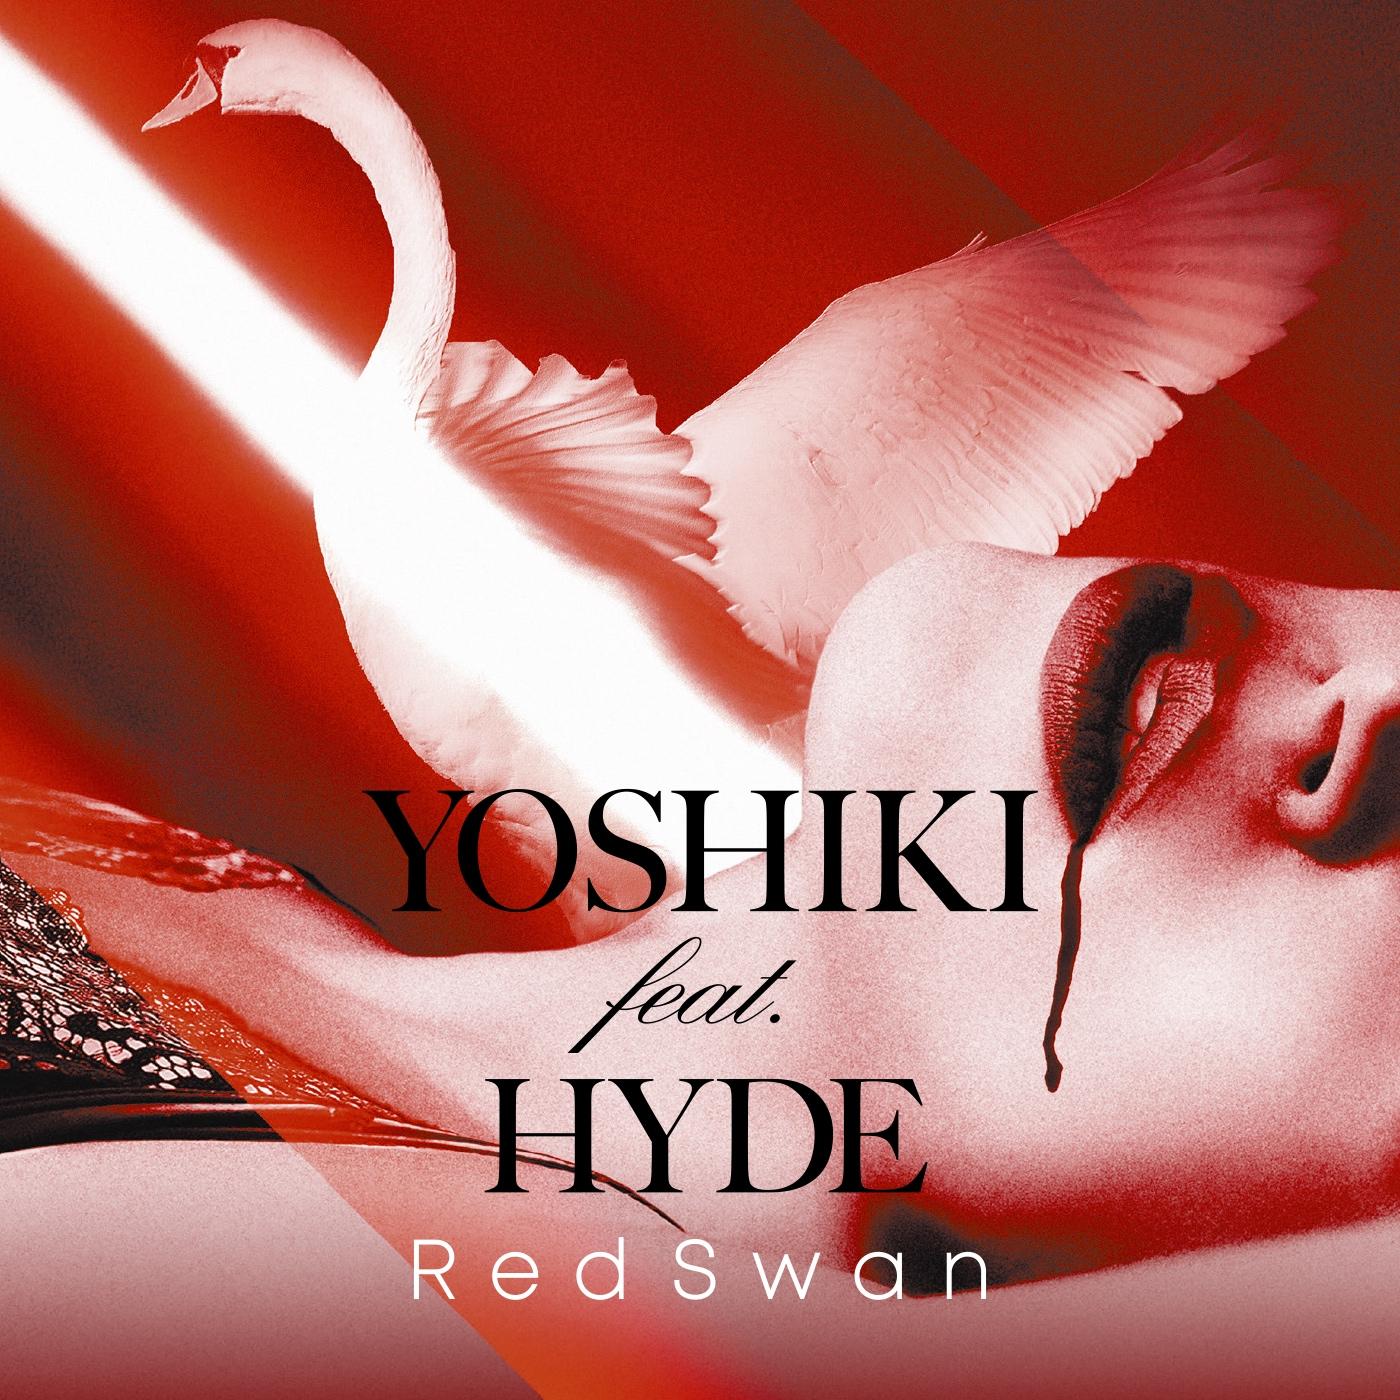 RMMS-Yoshiki-Hyde-Red-Swan-Music-Station-20180917-N-jacketYoshikiHyde